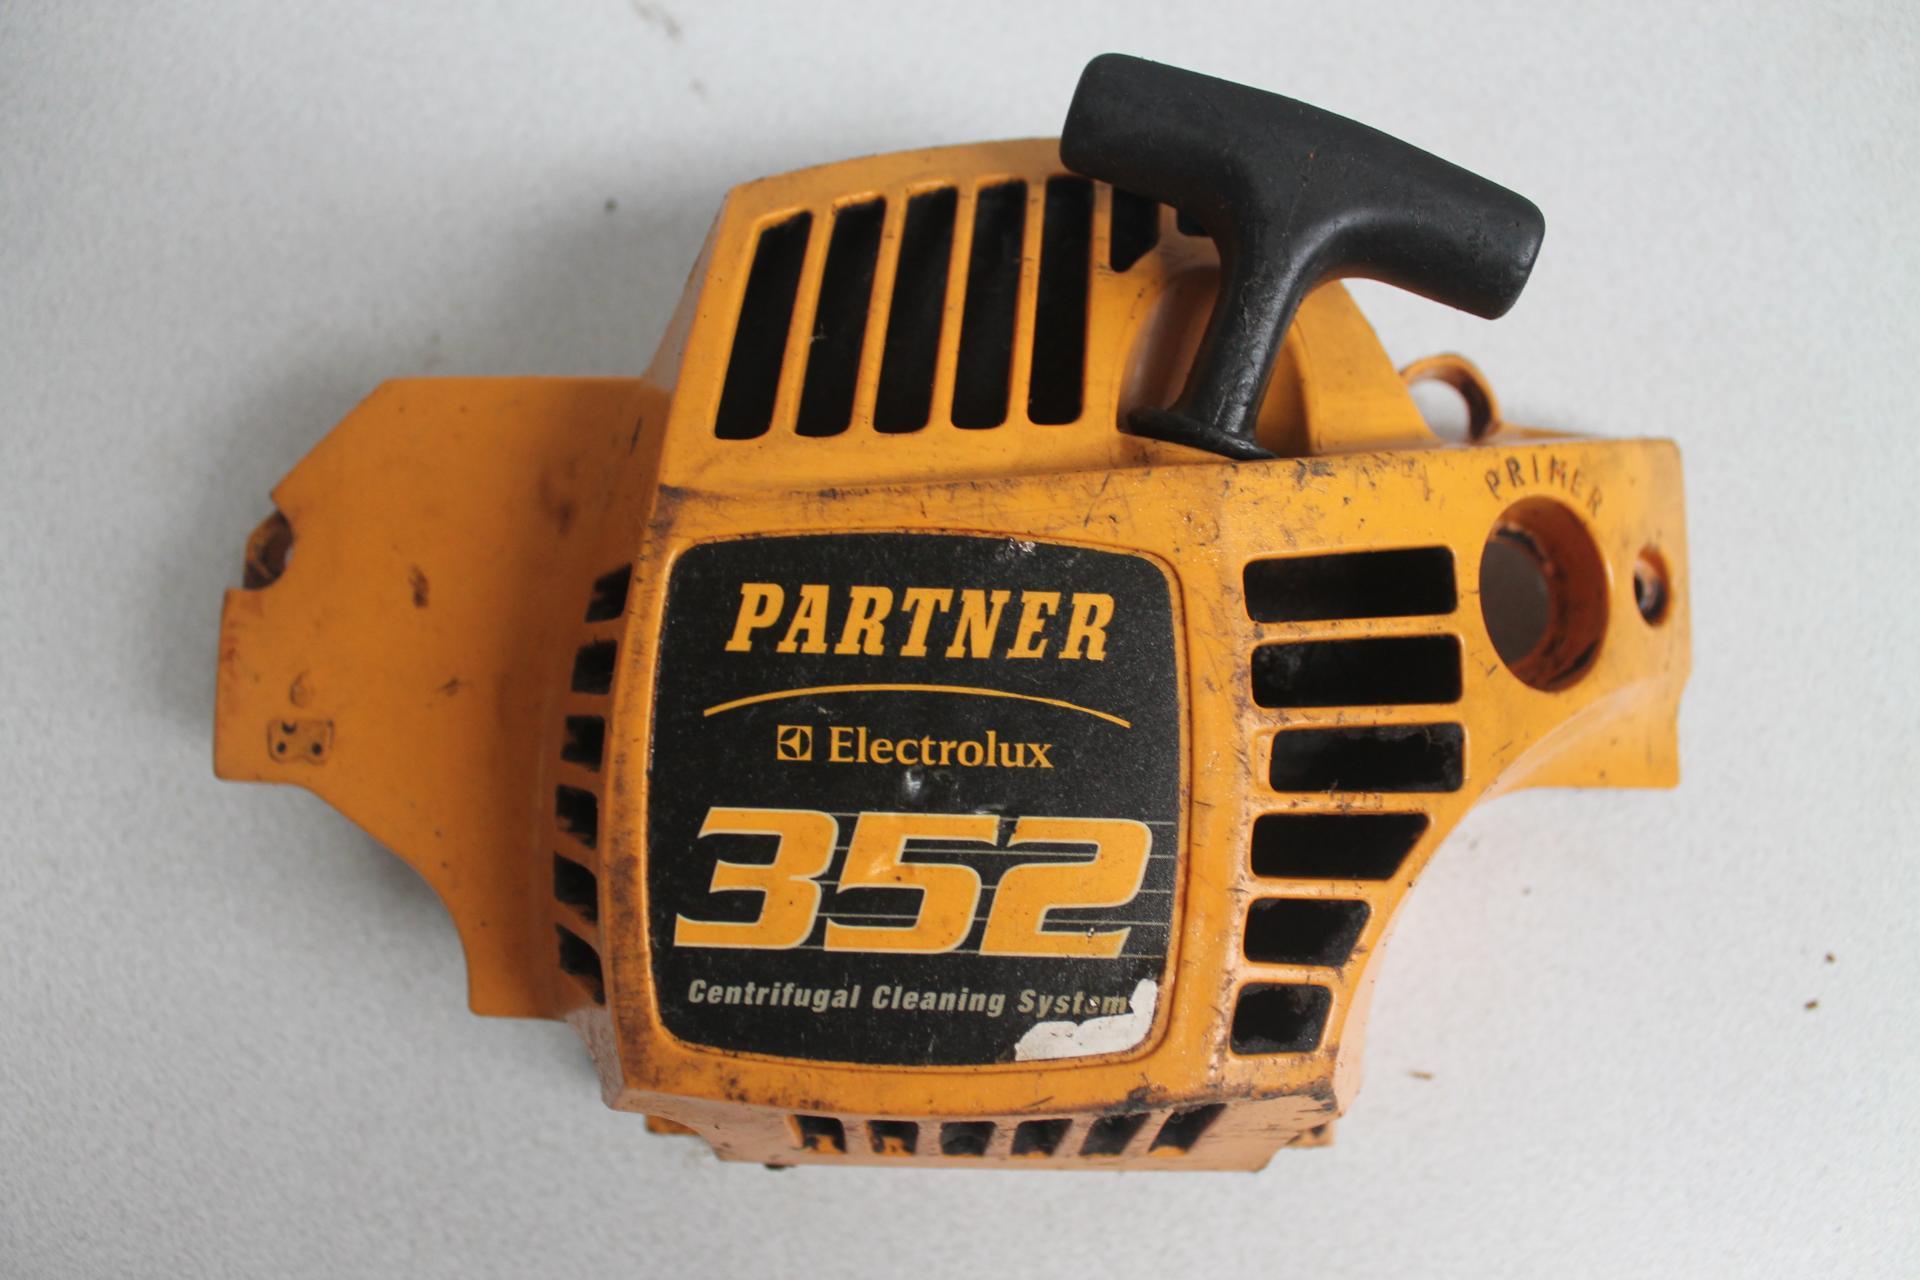 Arranque Partner 352